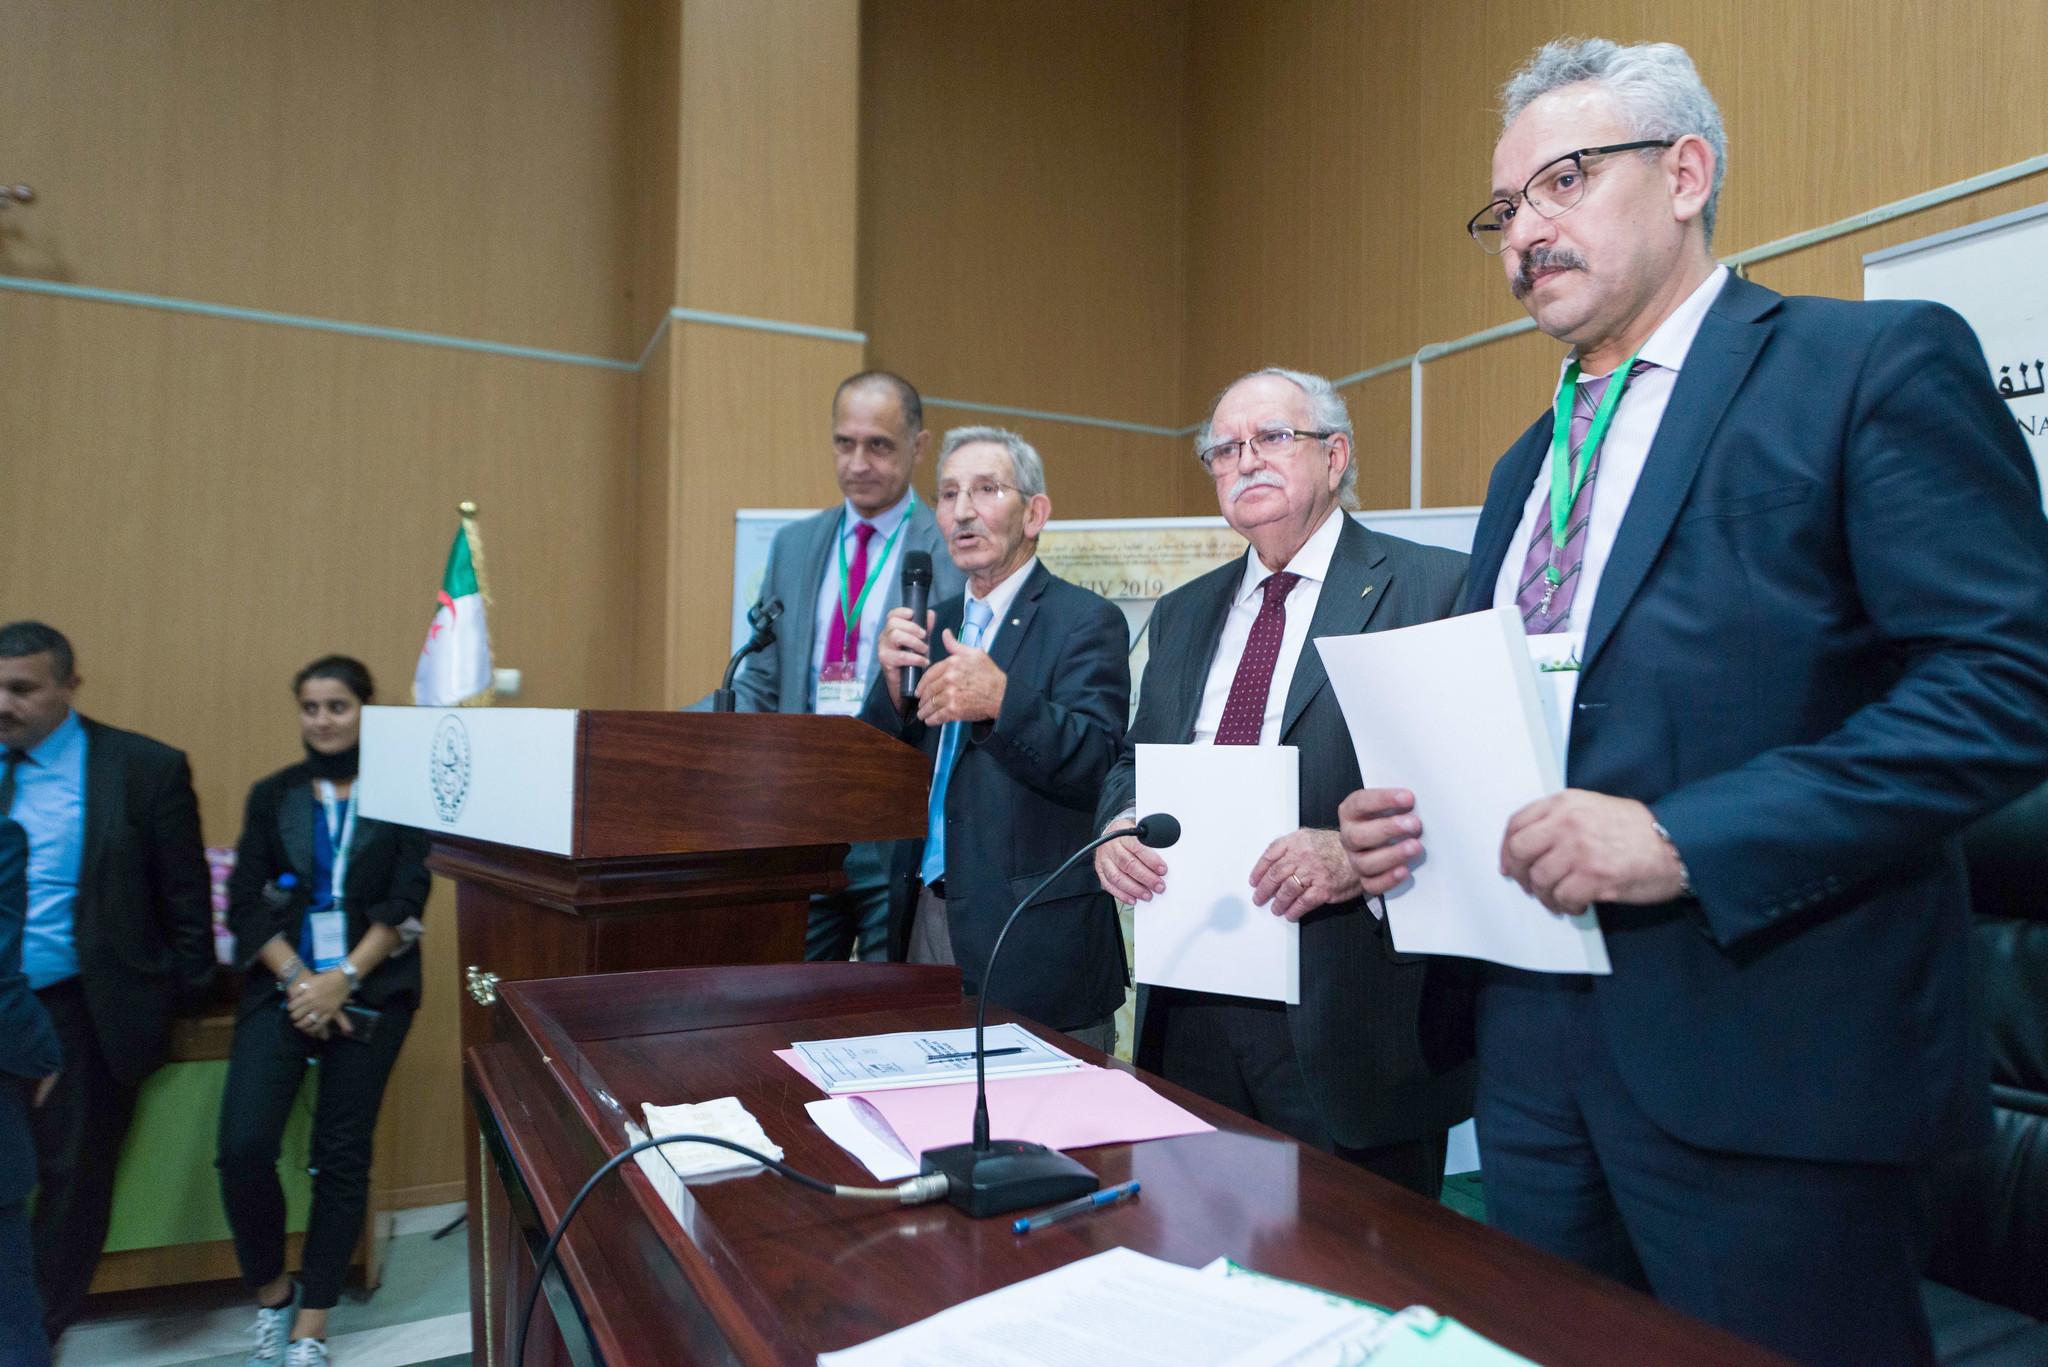 SIPSA-FILAHA 2019 - Signature du contrat Itgc - GRFI